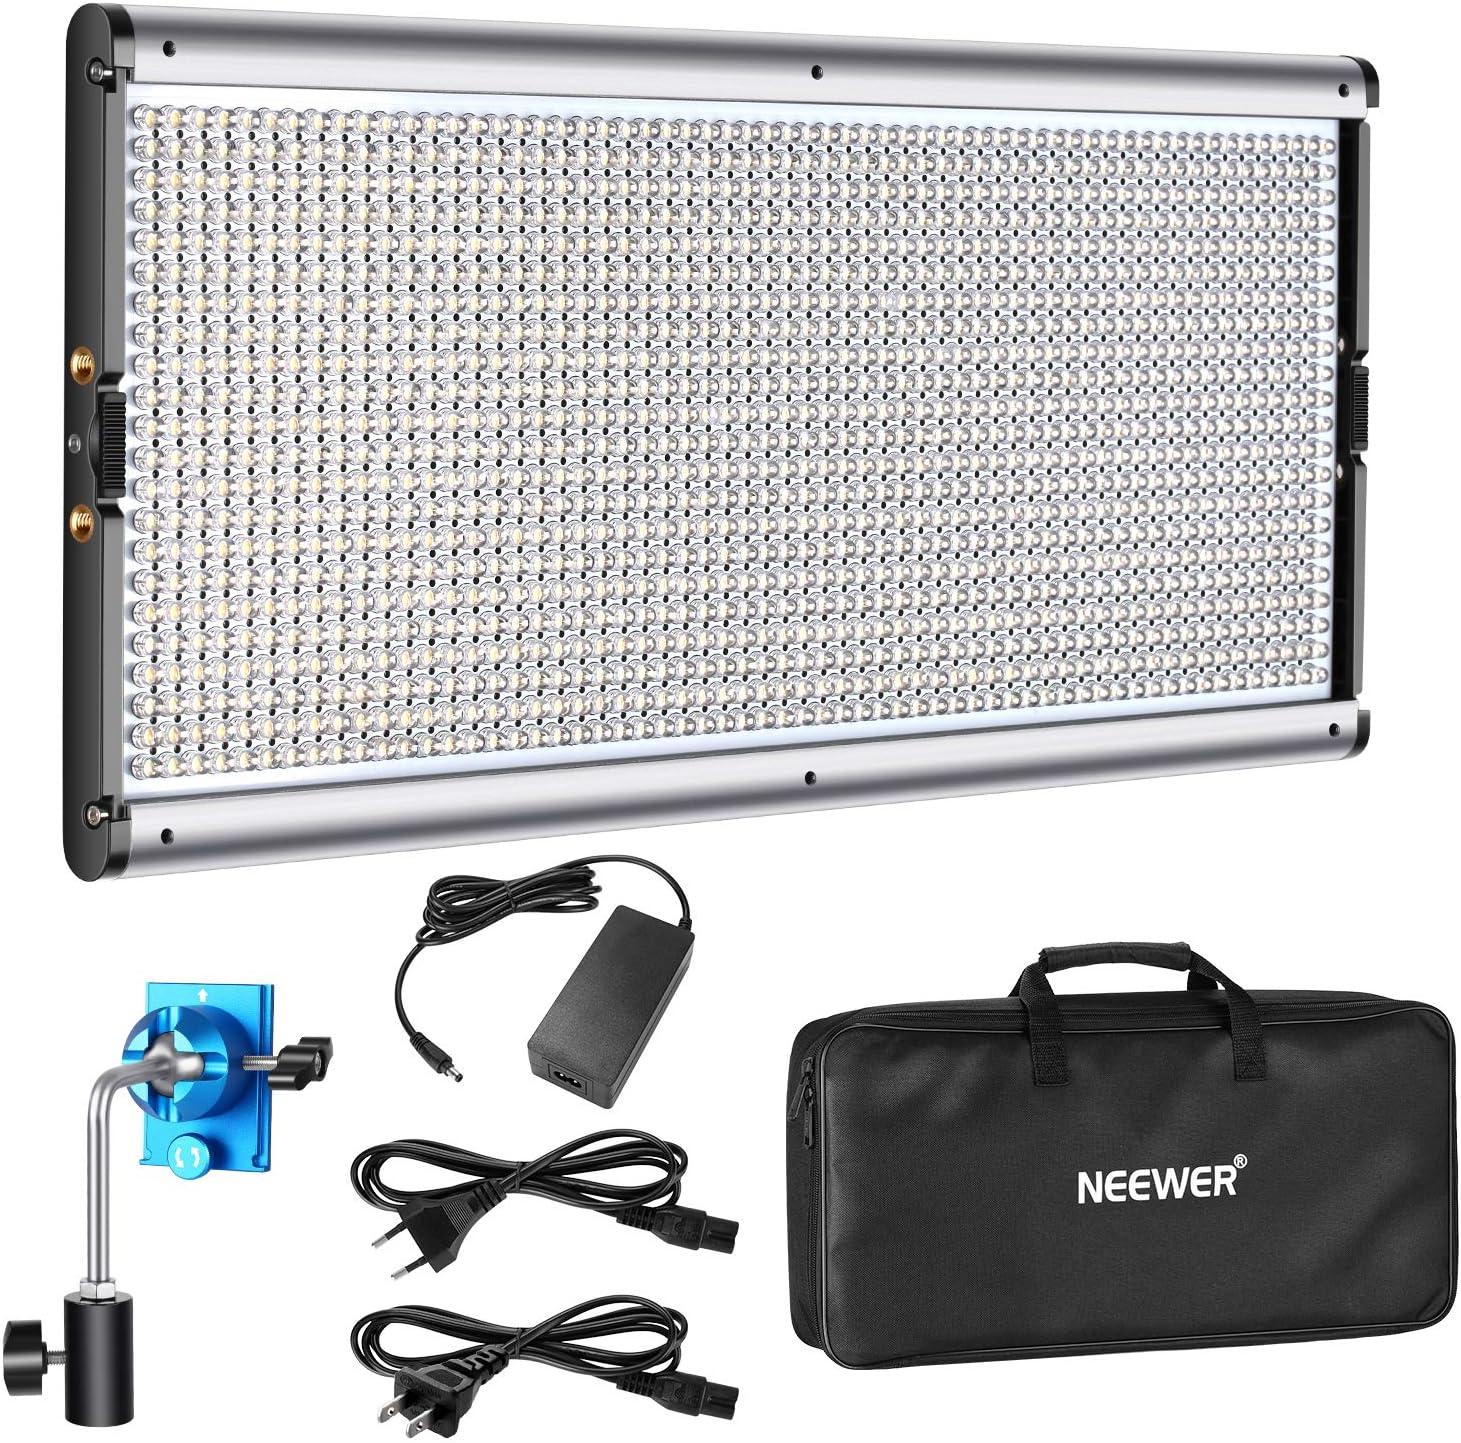 Luz de video 1320 LED regulable Neewer con marco de metal